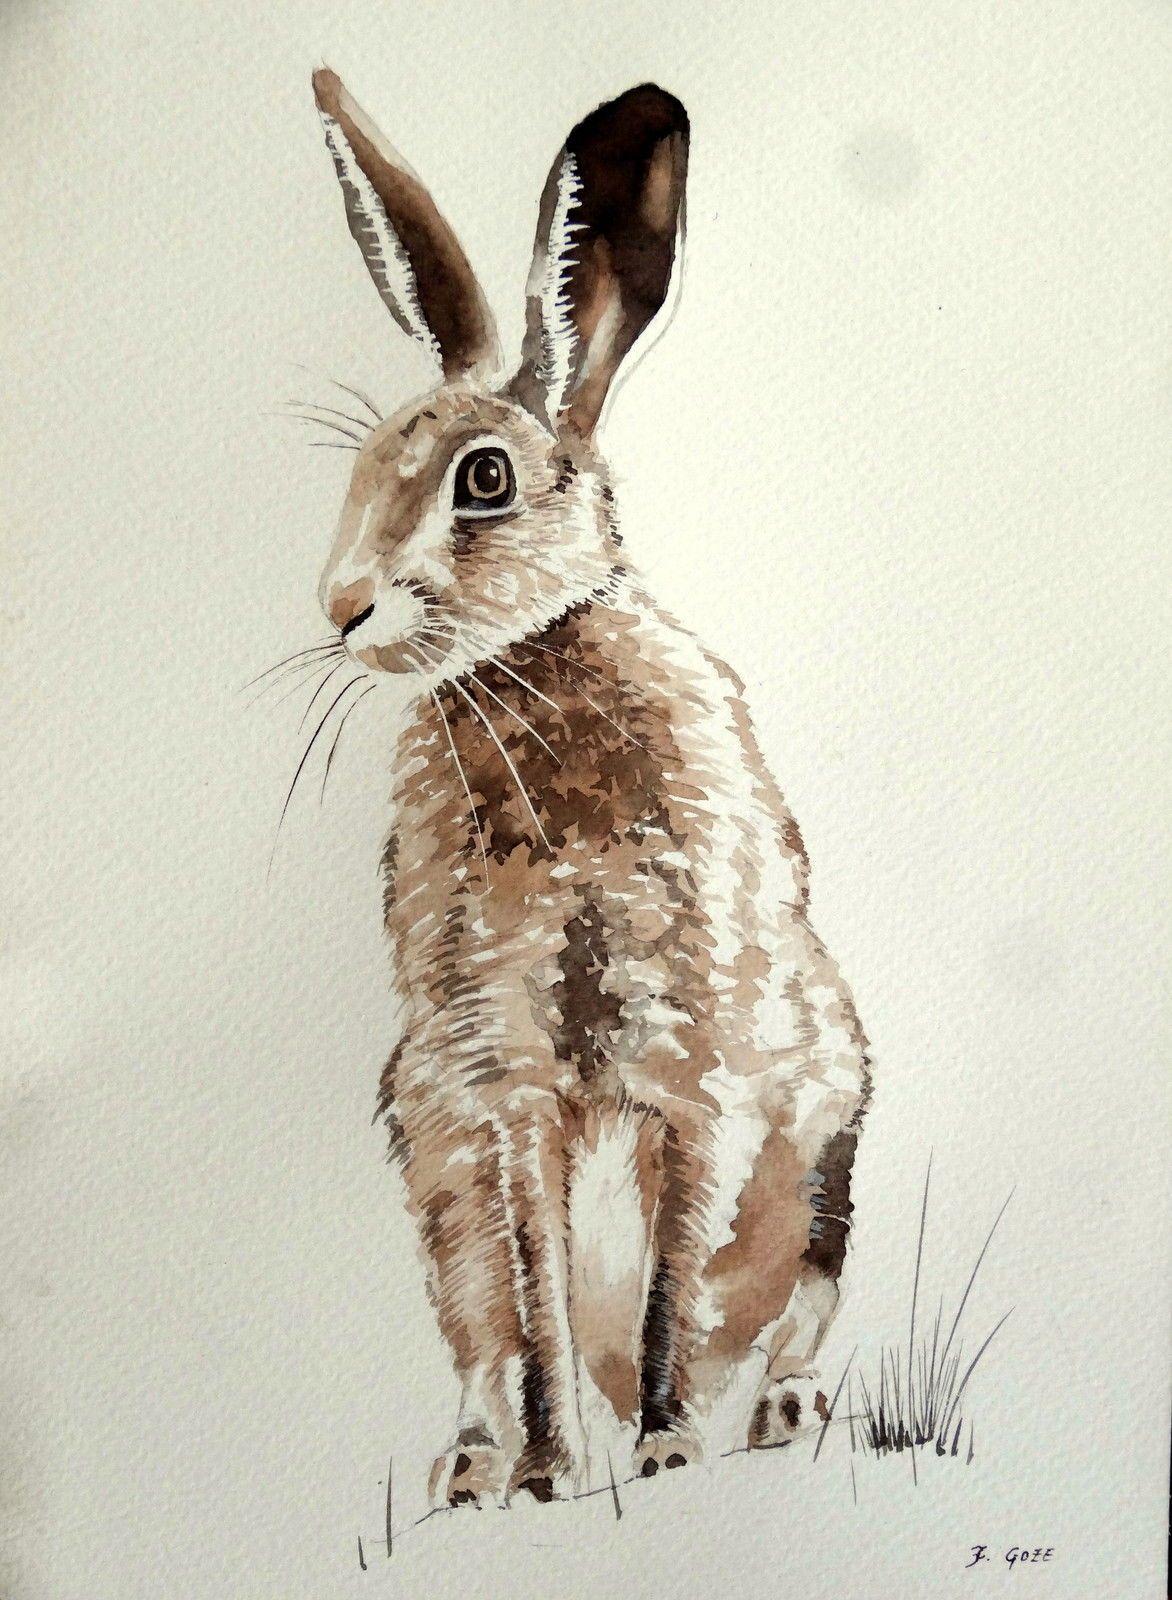 Dessin lavis encre aquarelle sepia original li vre chasse - Dessin de chasse ...